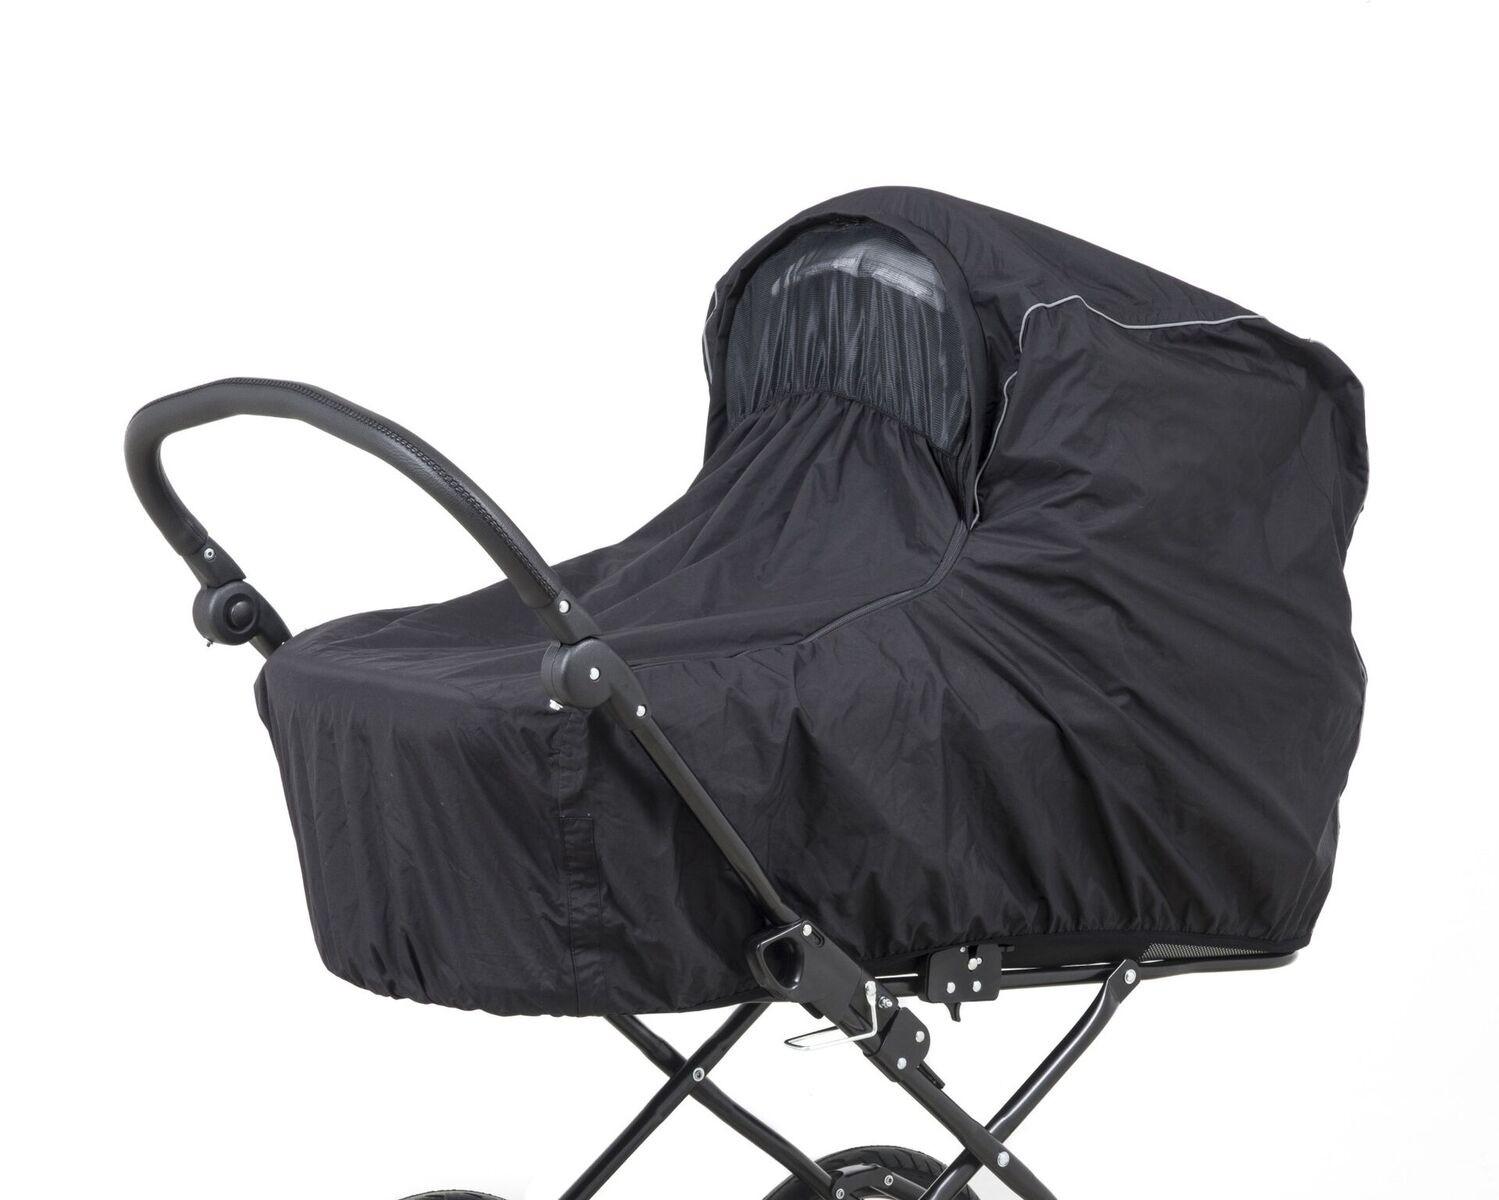 e50705ca0 Babytrold Regnslag LUX med myggenet og refleks, Sort